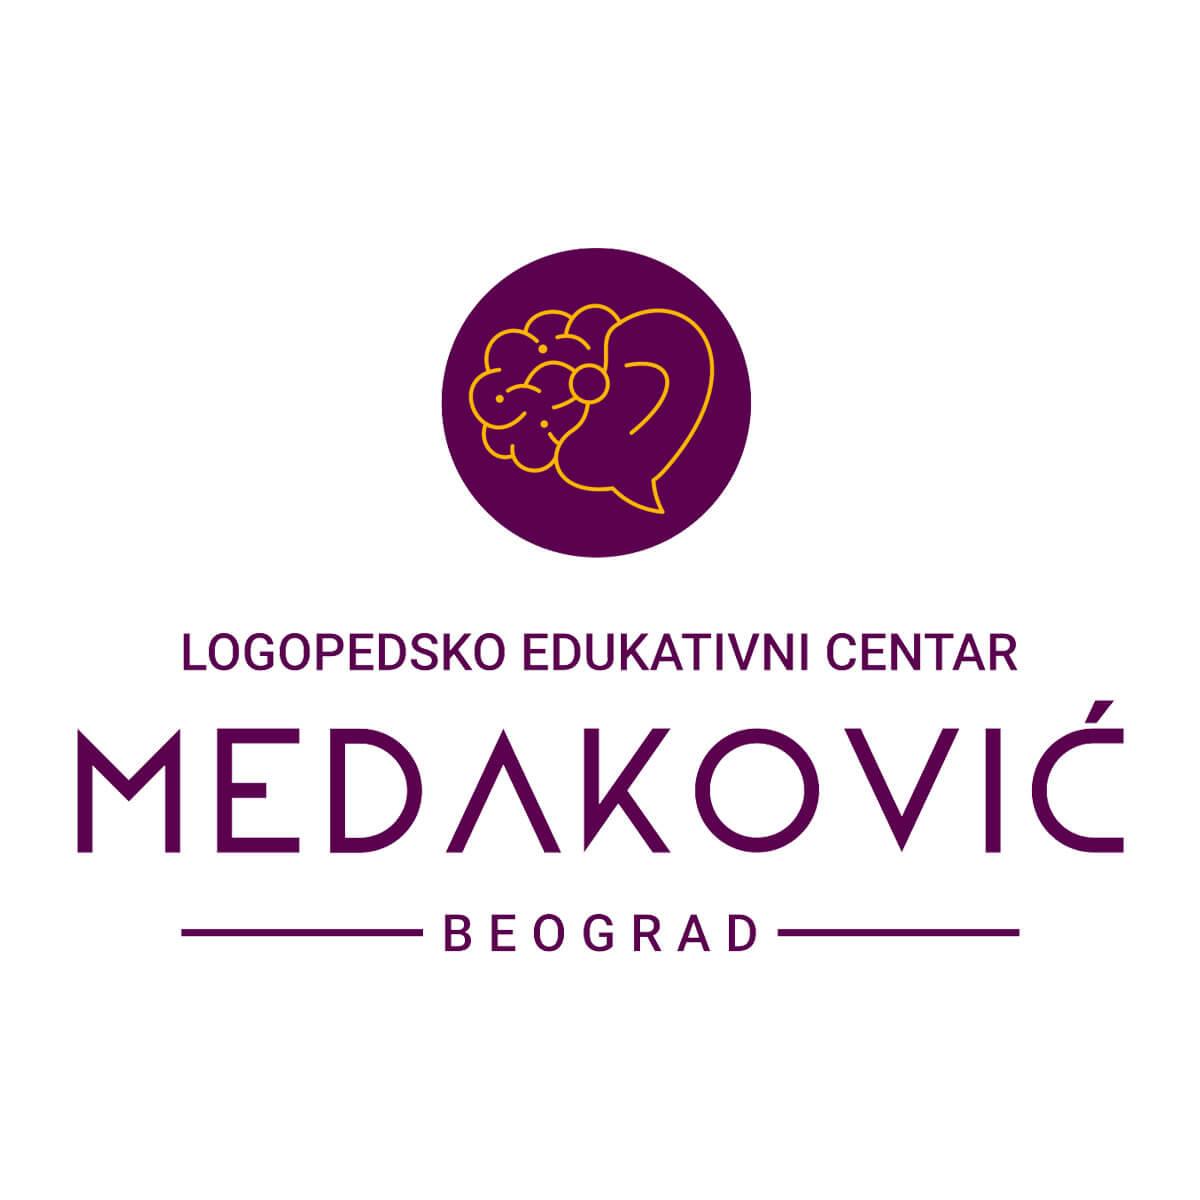 logo za logopedsko edukativni centar medaković